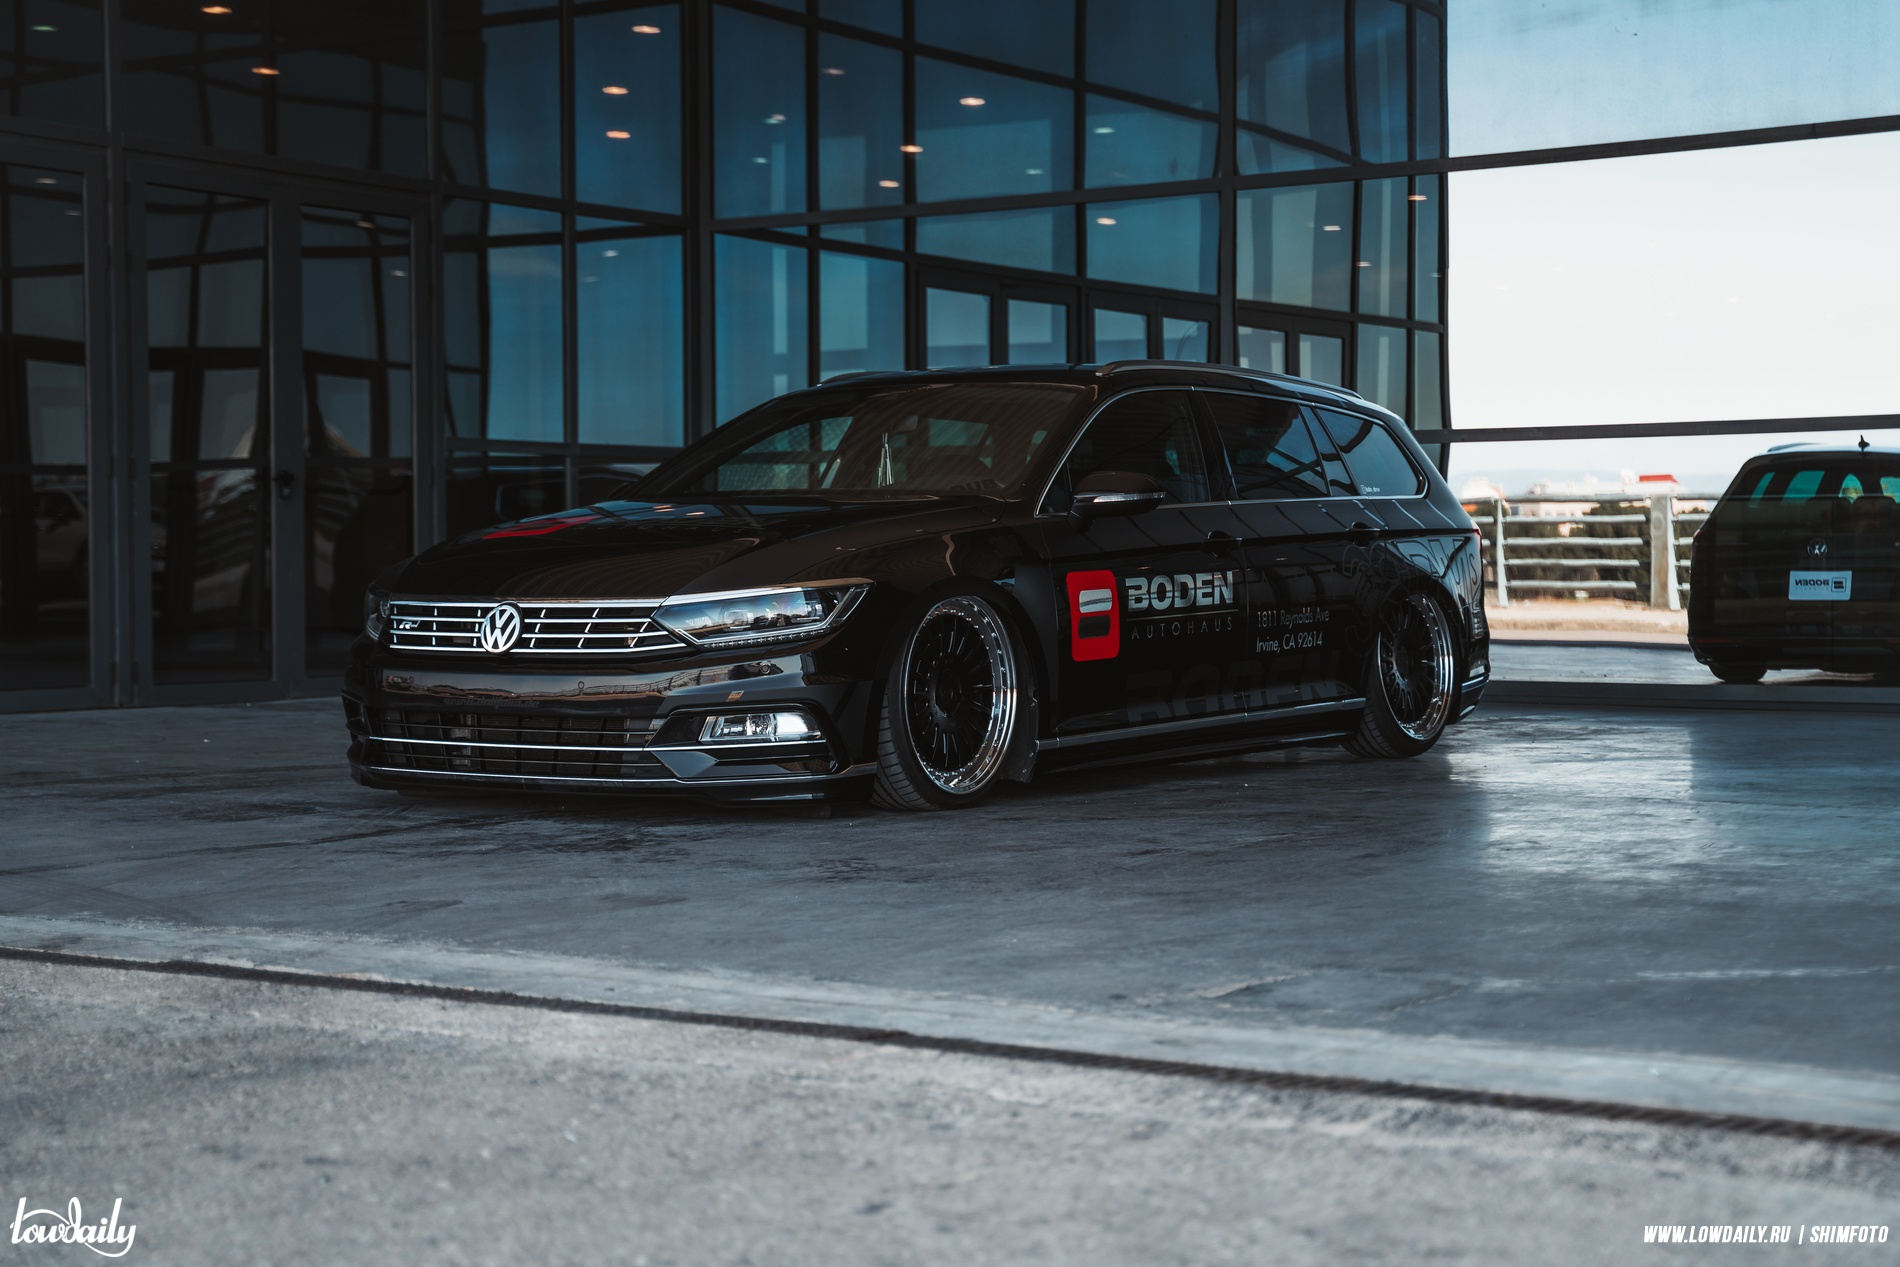 DSC02802 Volkswagen Passat Boden Autohaus